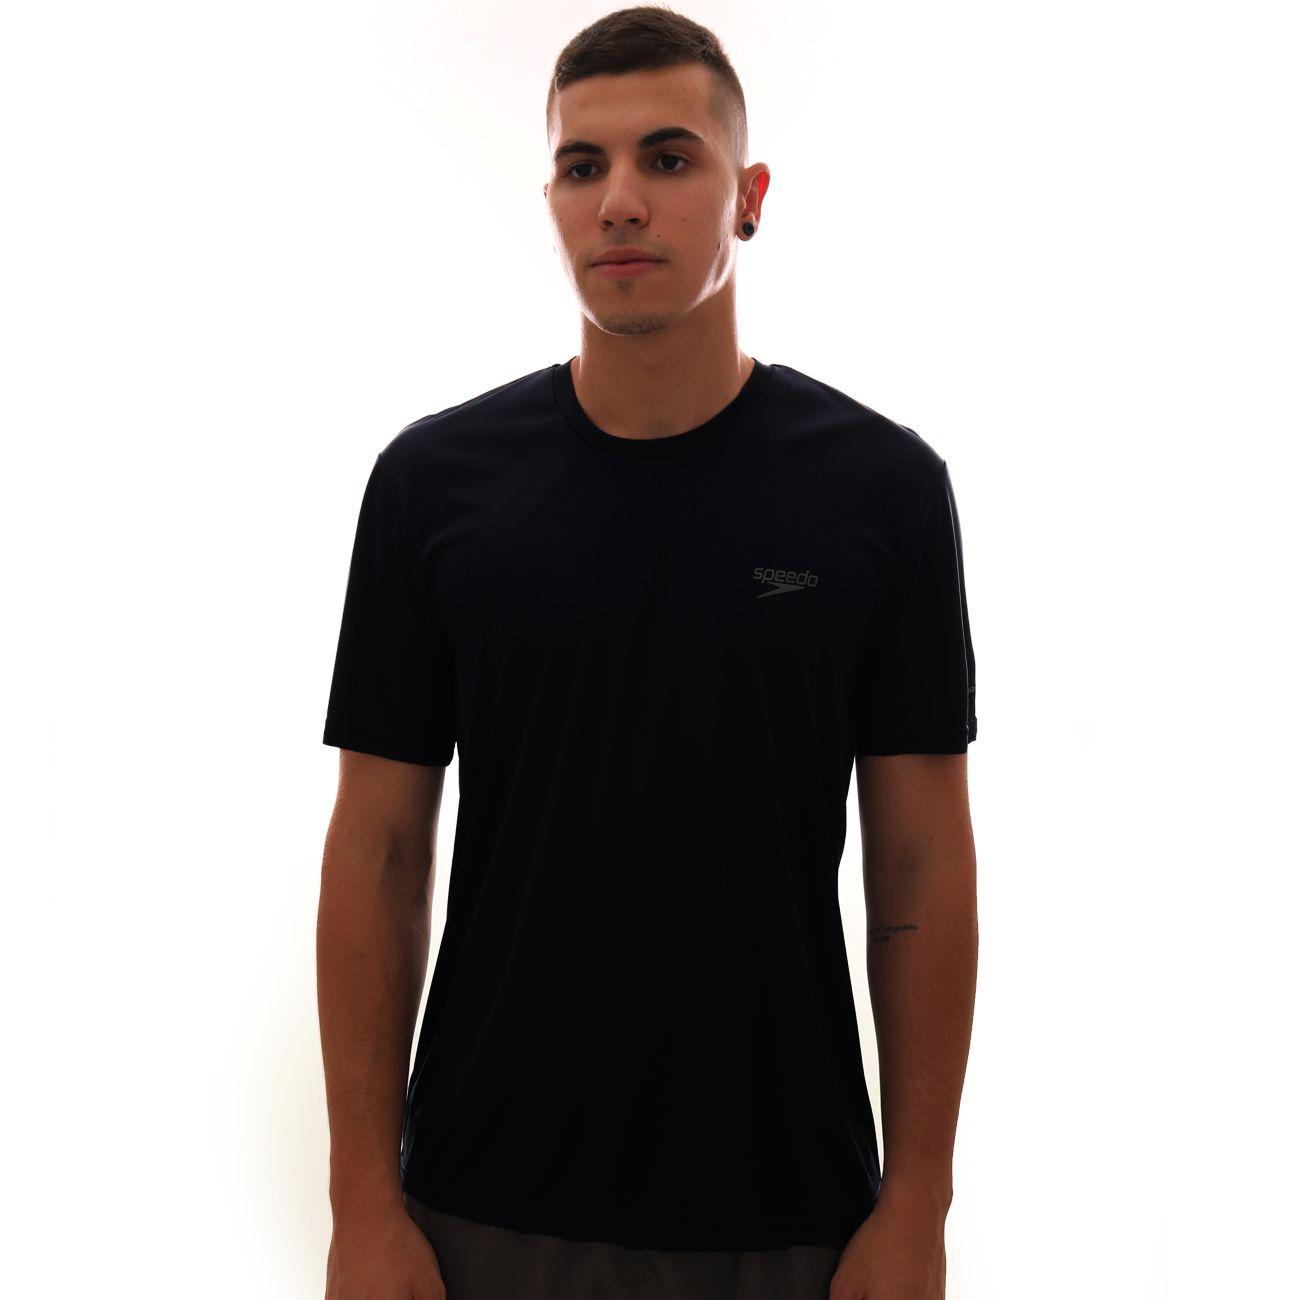 Camiseta Speedo Interlock UV50 Masculina Preto